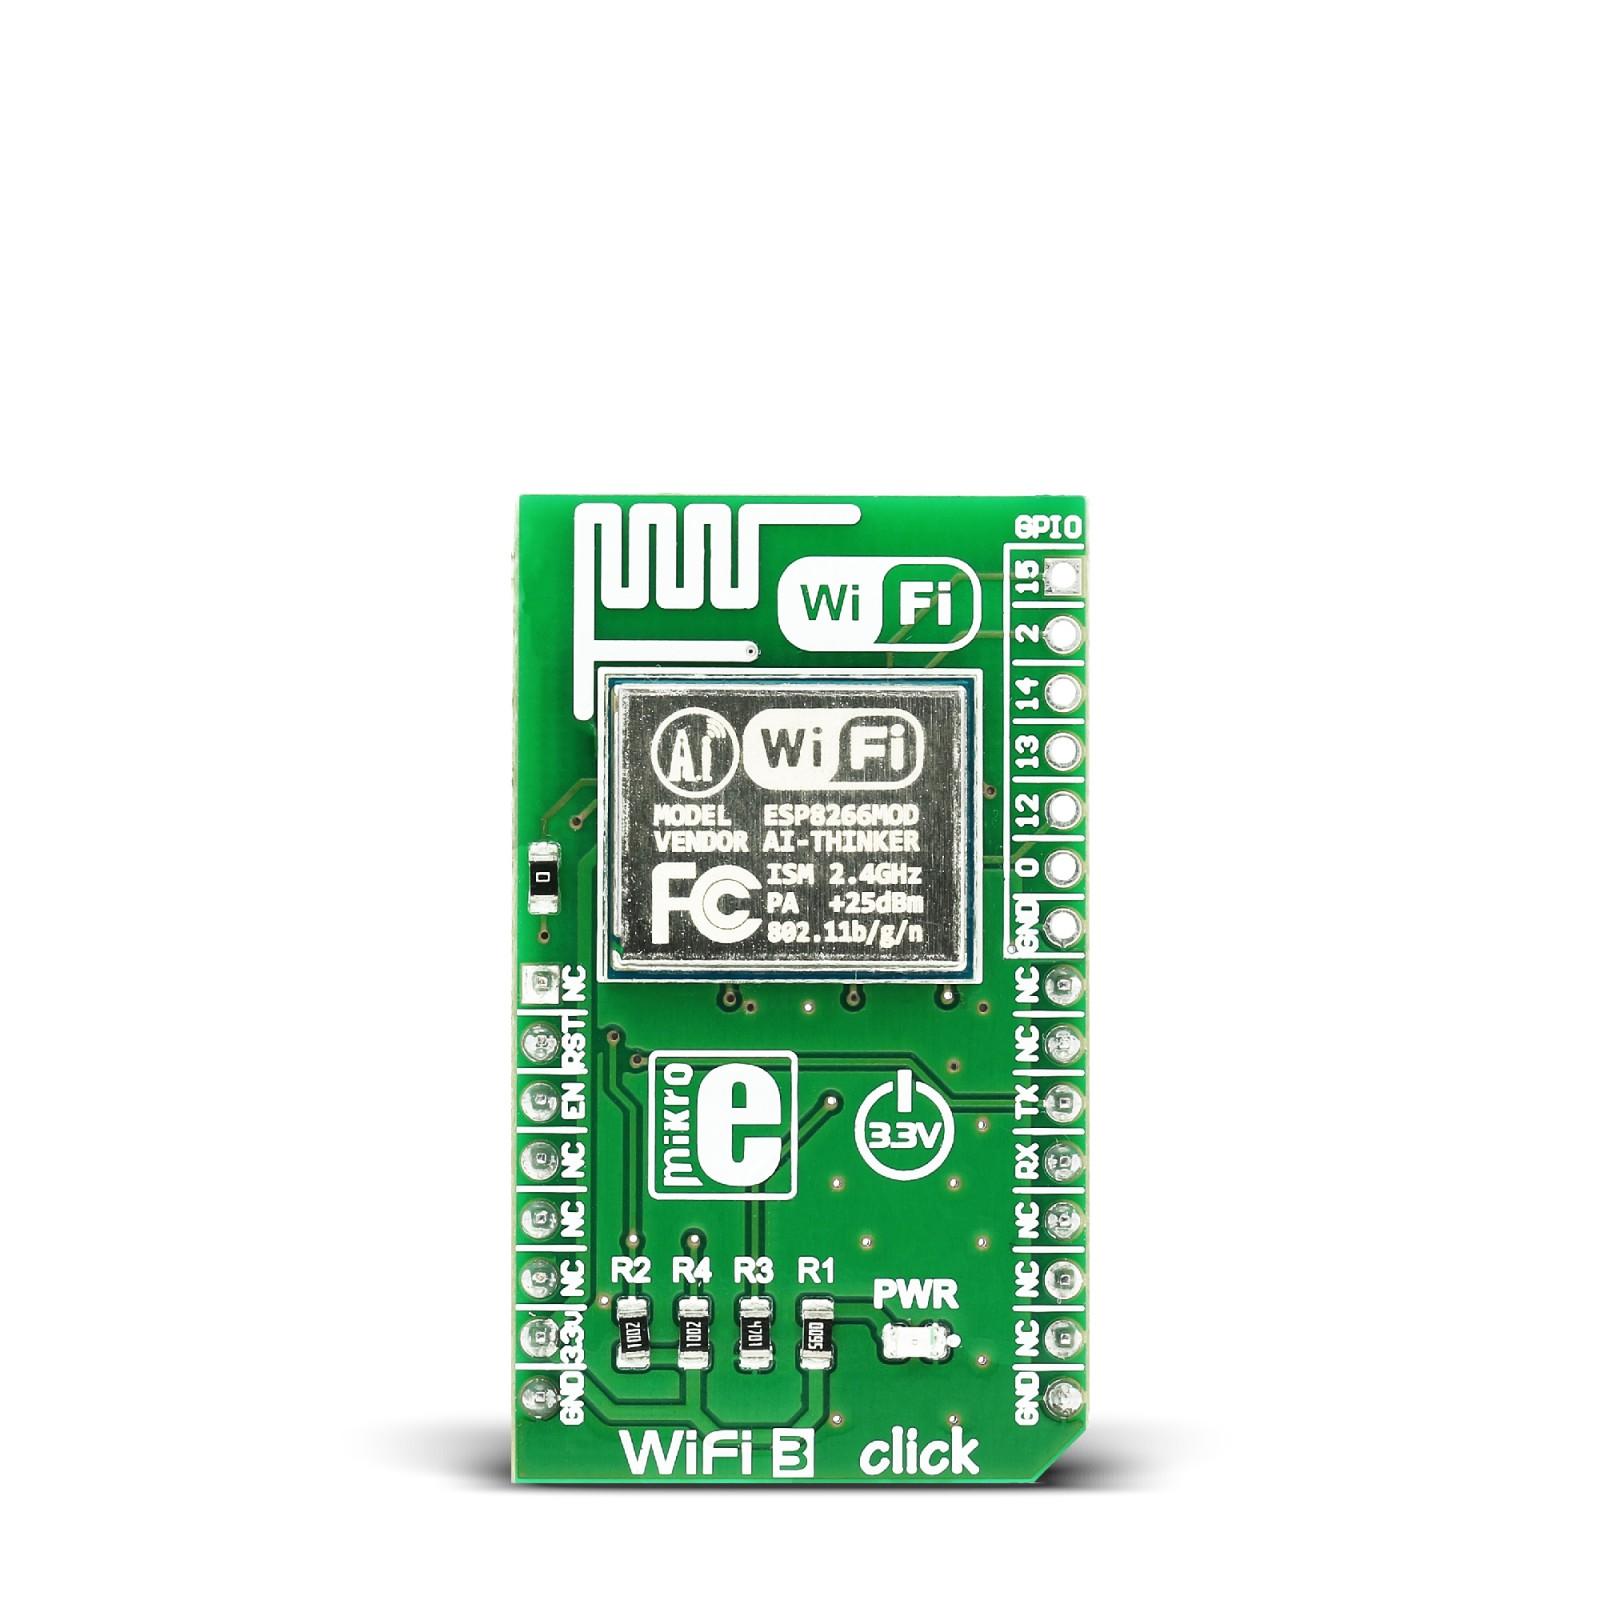 WiFi3 click is a WiFi add-on board carrying ESP8266MOD